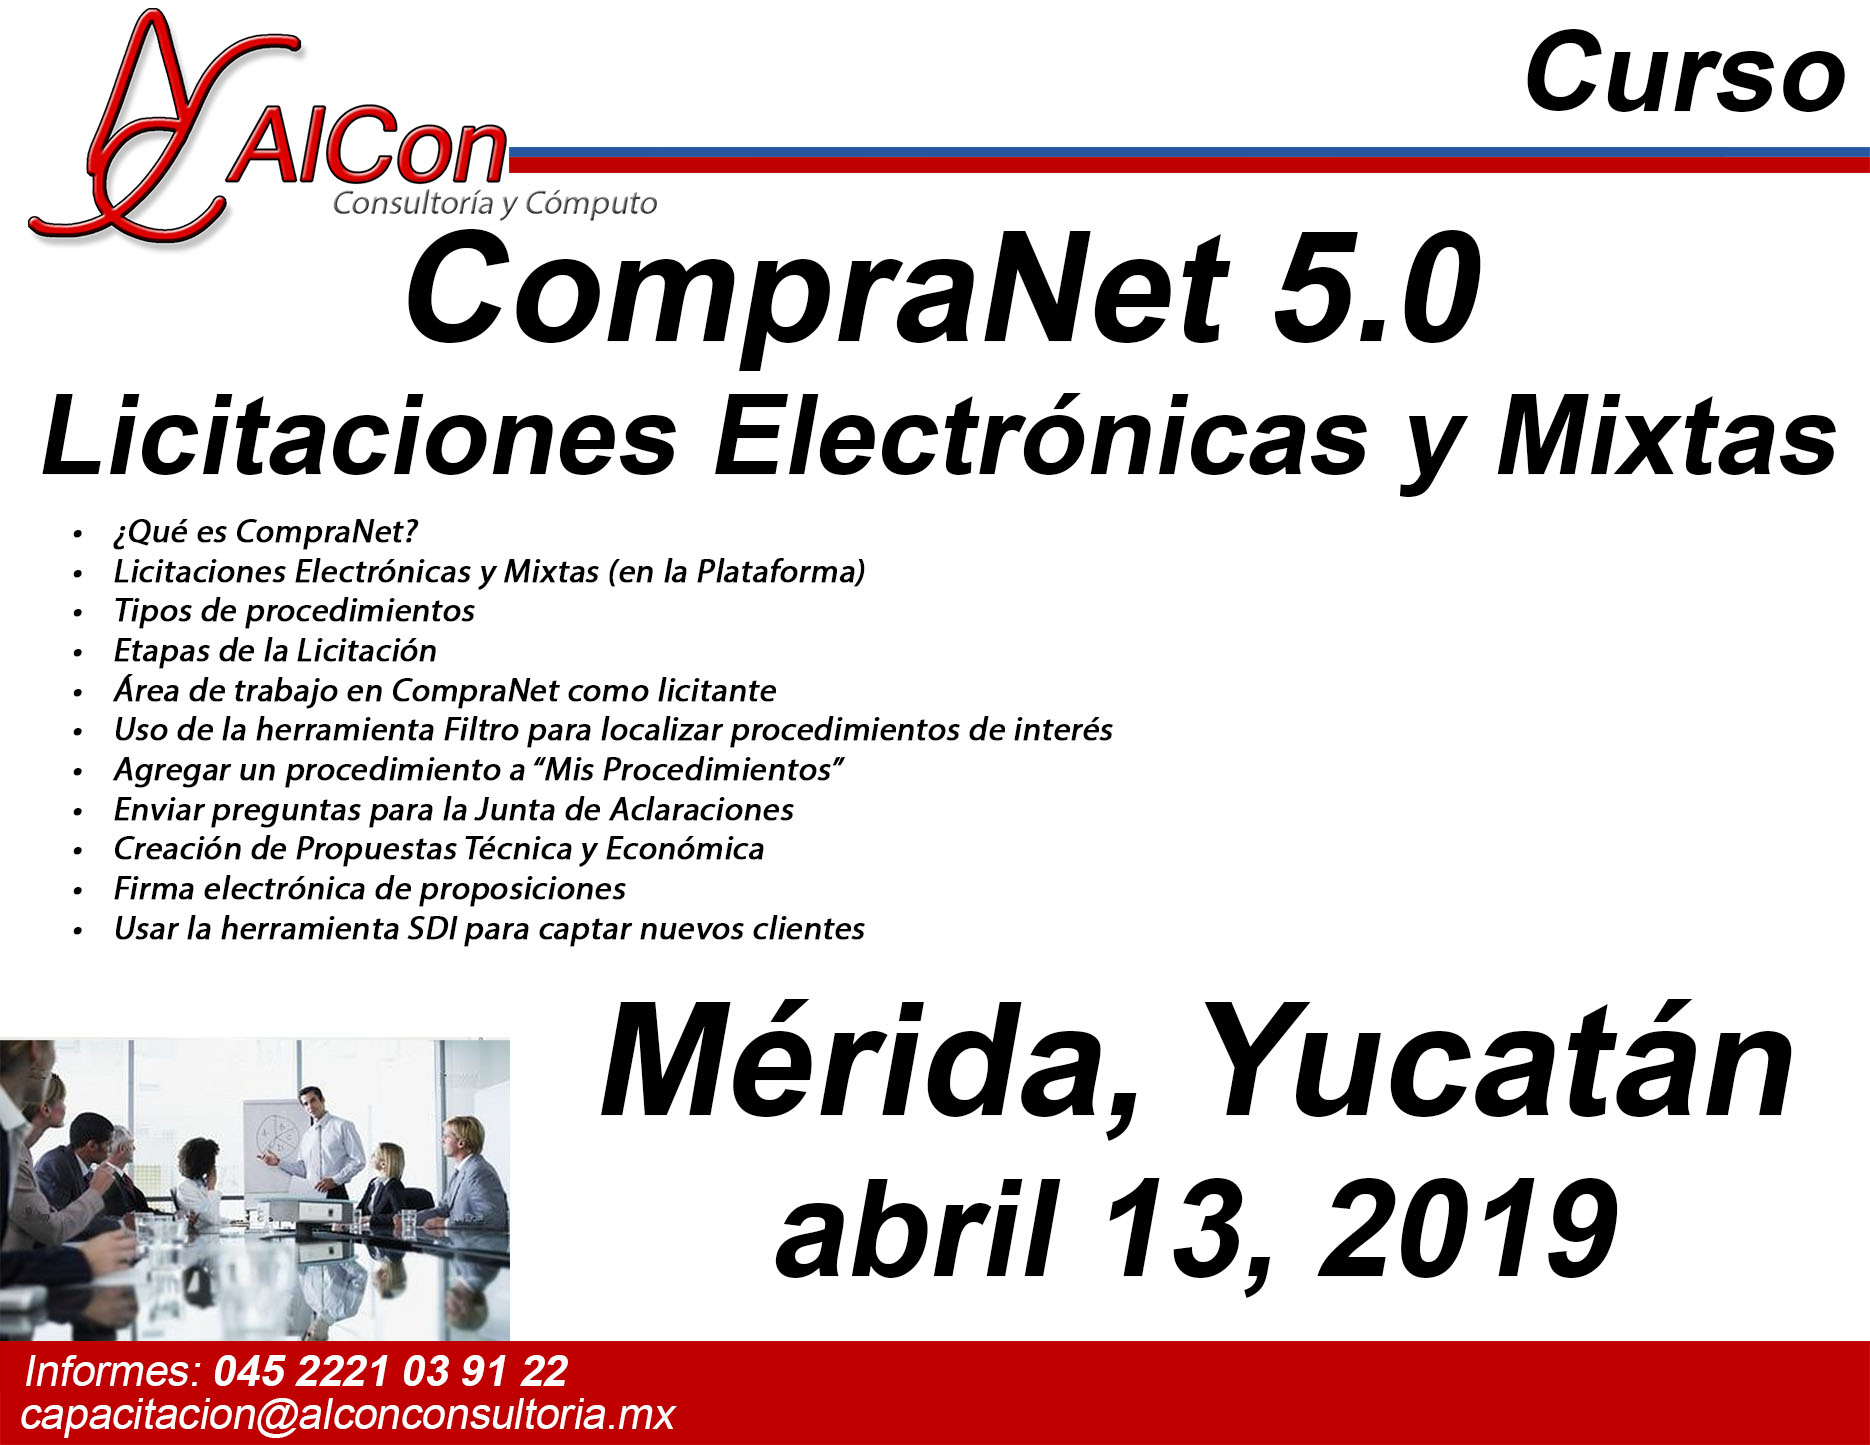 Curso CompraNet 5.0 Mérida, Yucatán